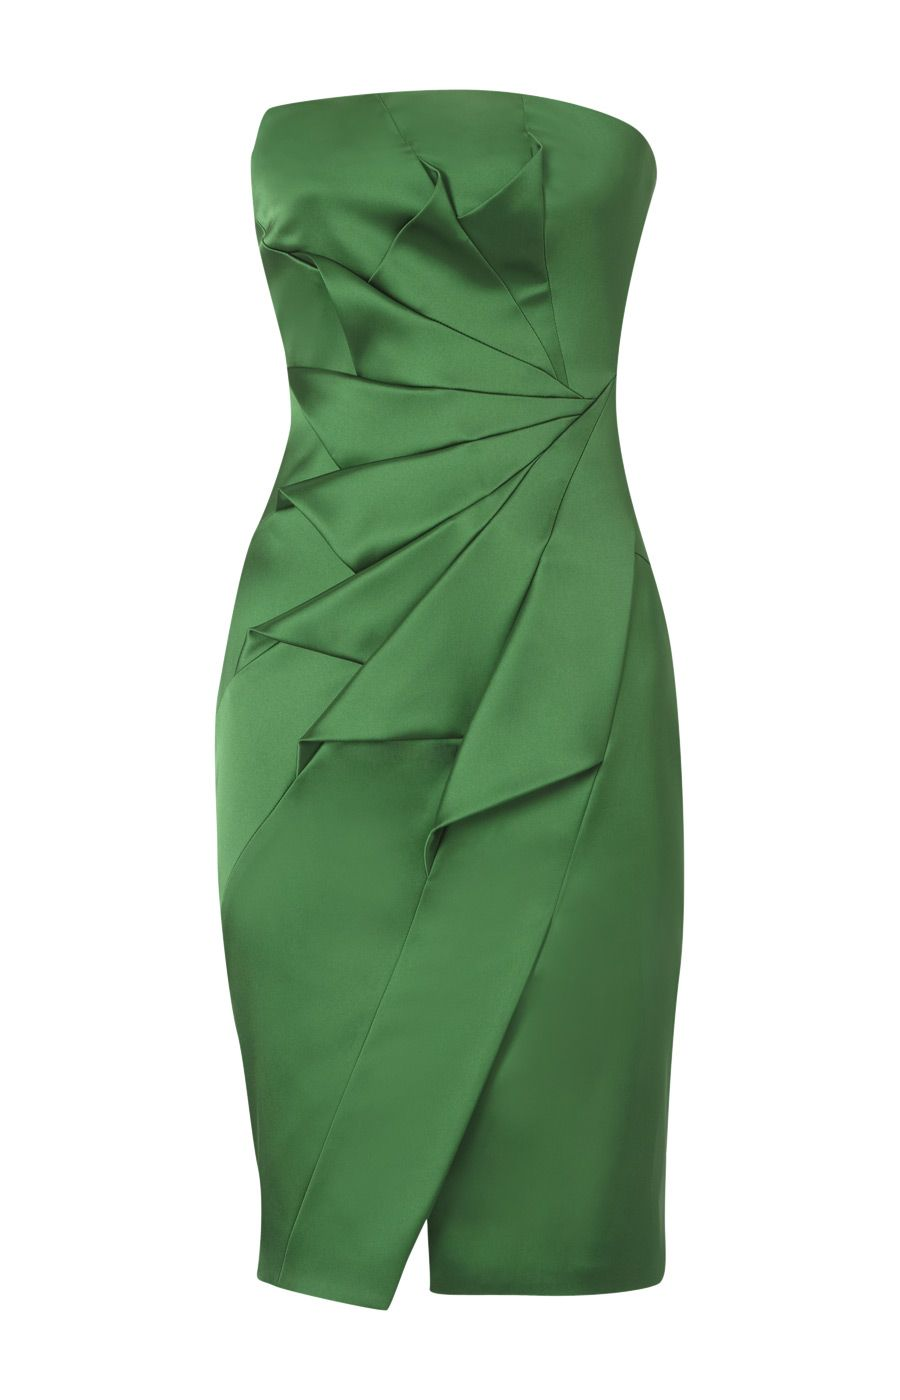 Photo of EMERALD GREEN KAREN MILLEN PARTY OCCASIONAL DRESS SIZE 14 BN…